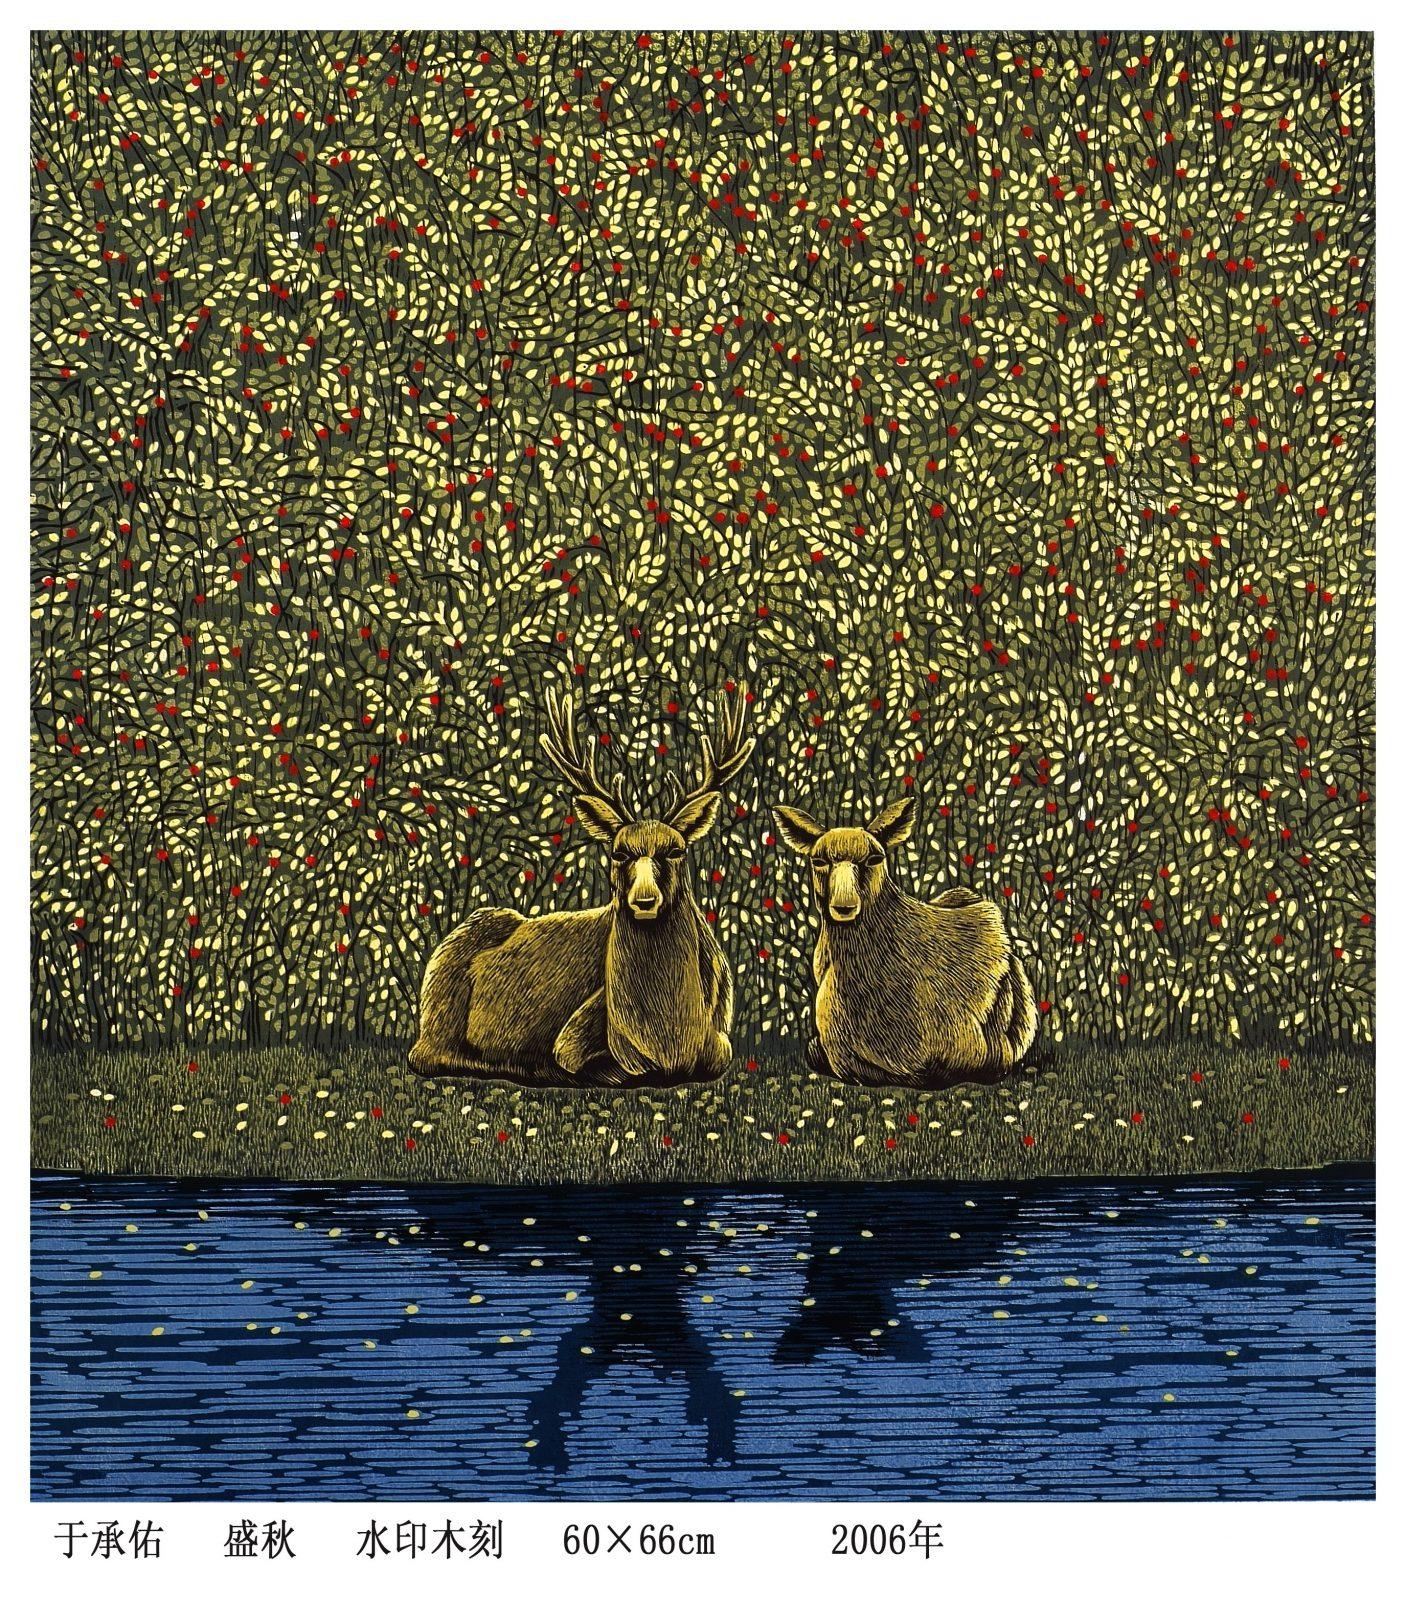 Golden autumn 盛秋, 60x66cm, woodcut